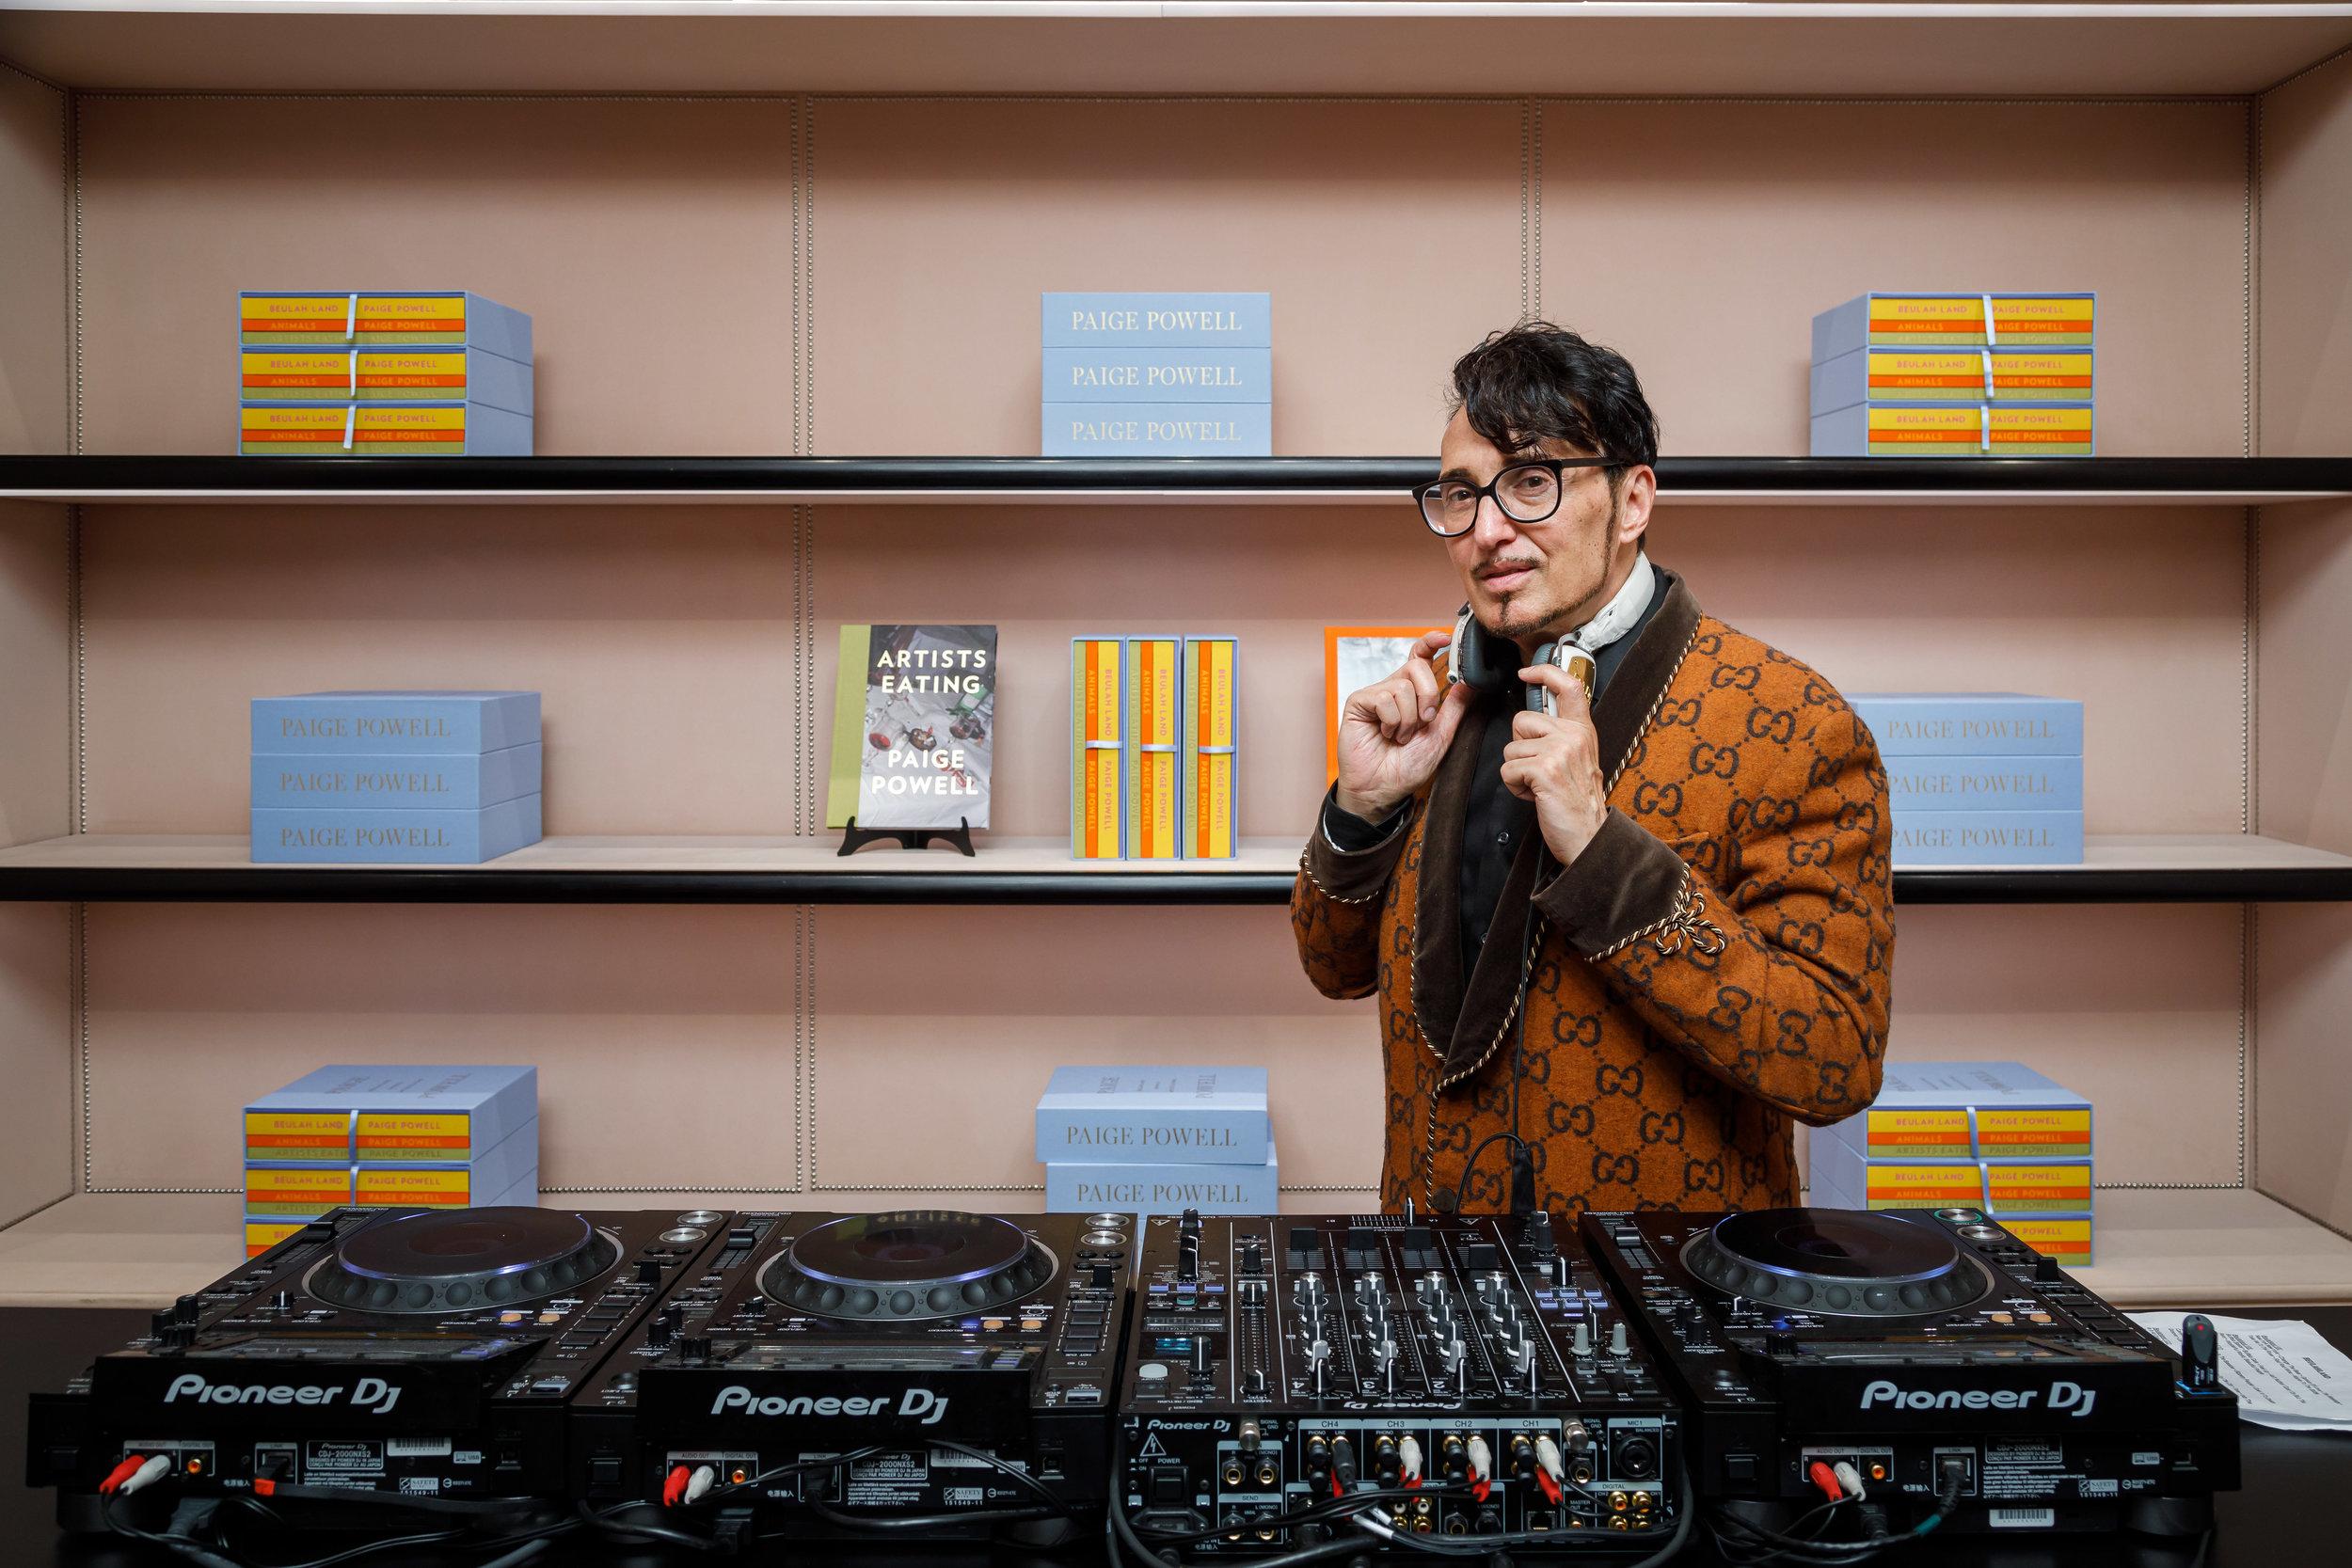 DJ Johnny Dynell